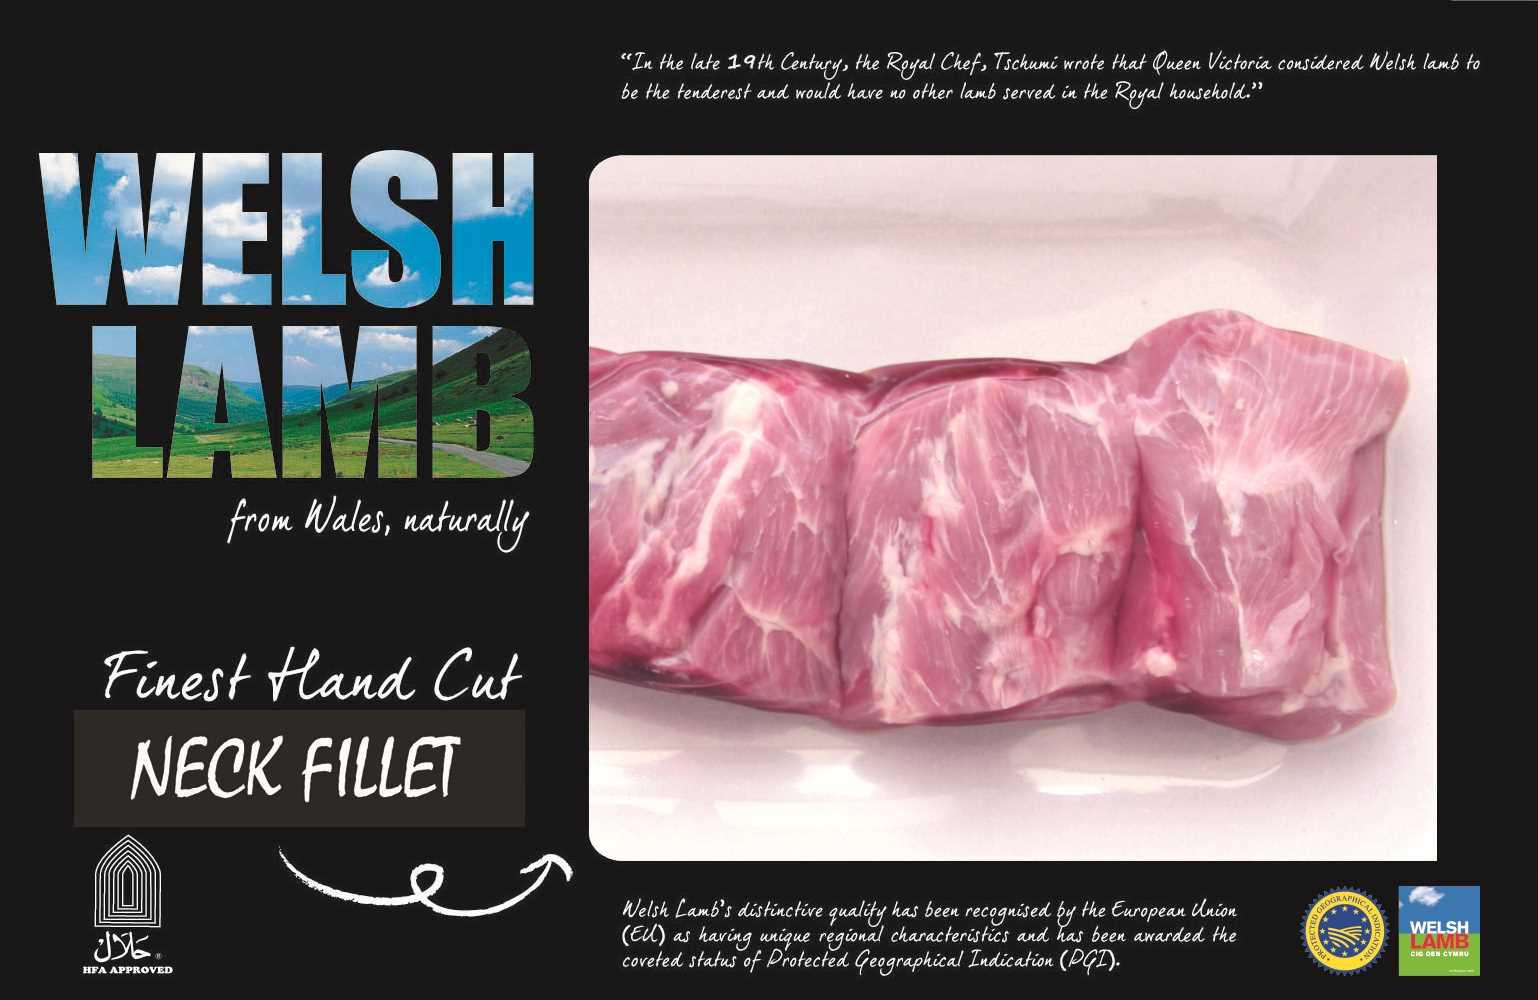 Welsh Lamb Neck Fillet